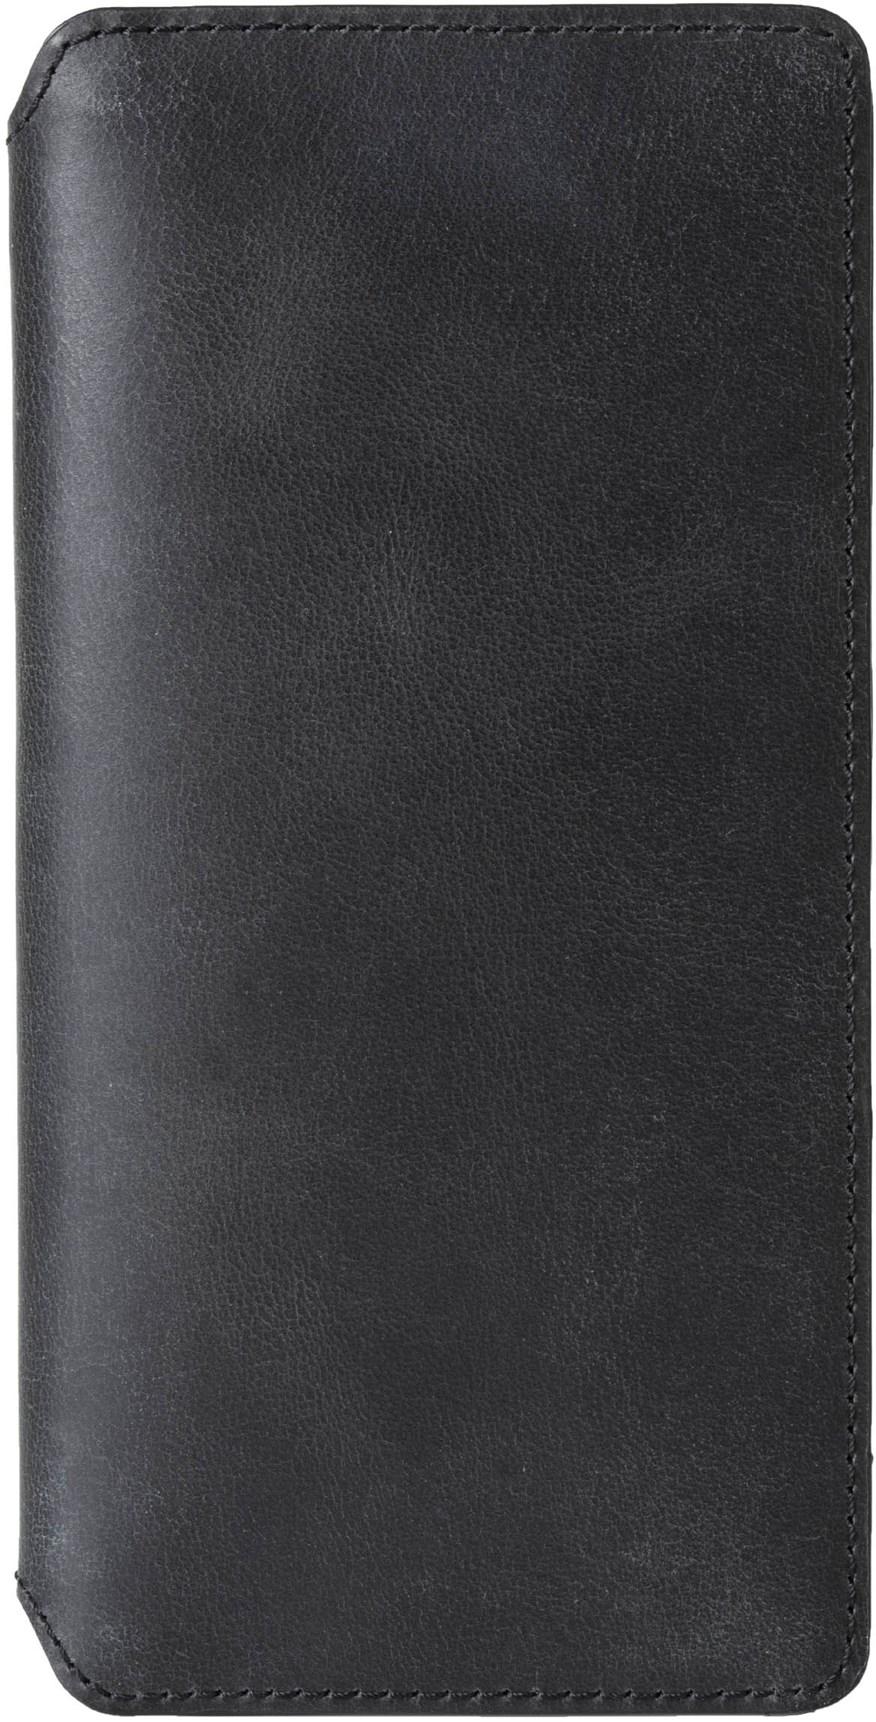 Krusell Sunne Phonewallet Samsung Galaxy Note 10 Vintage Black